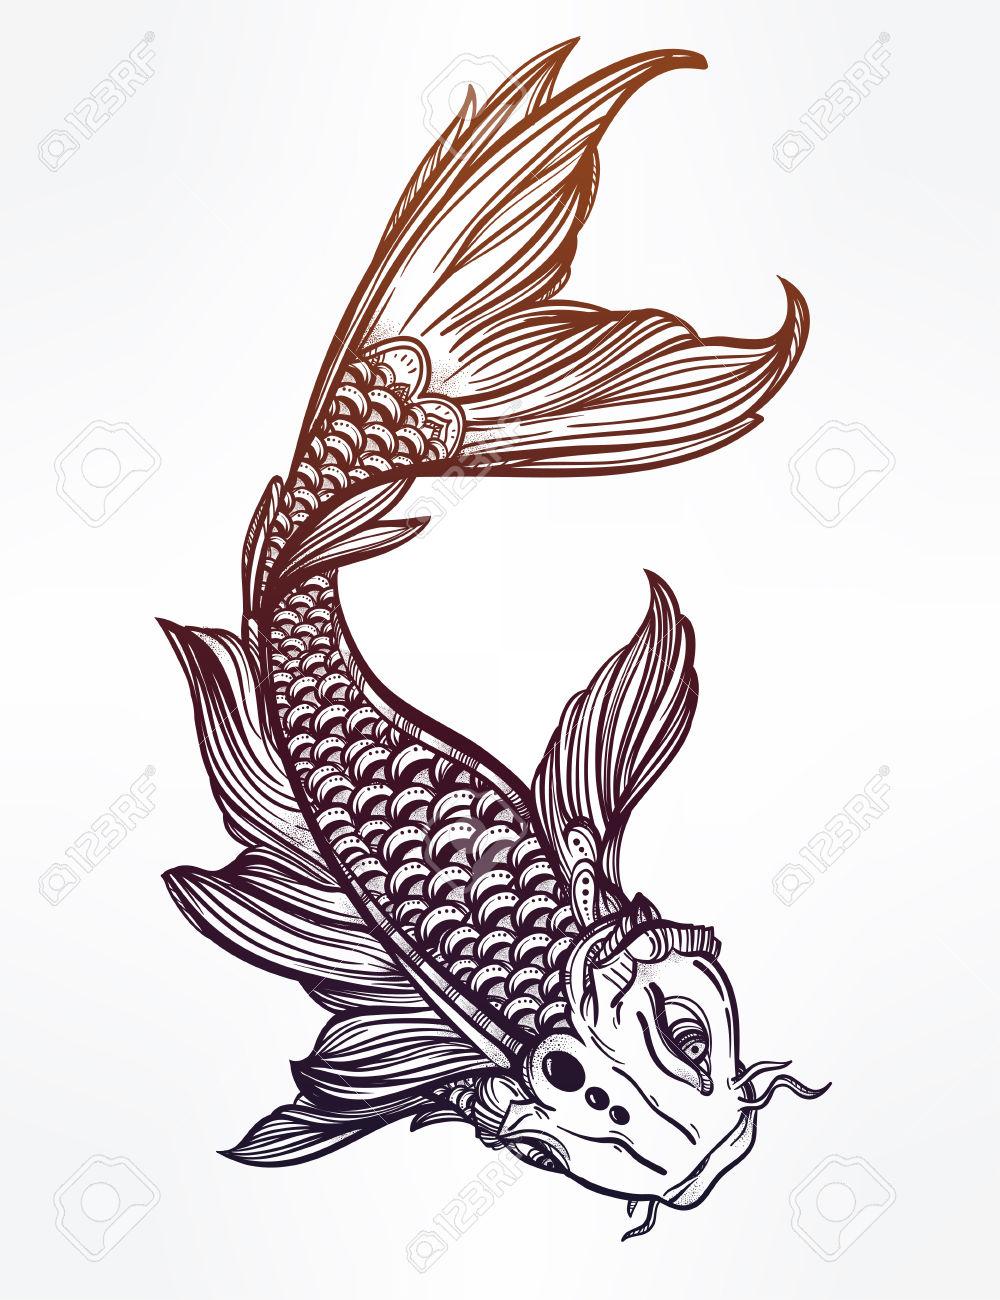 1000x1300 46673736 Hand Drawn Romantic Beautiful Line Art Of Fish Koi Carp